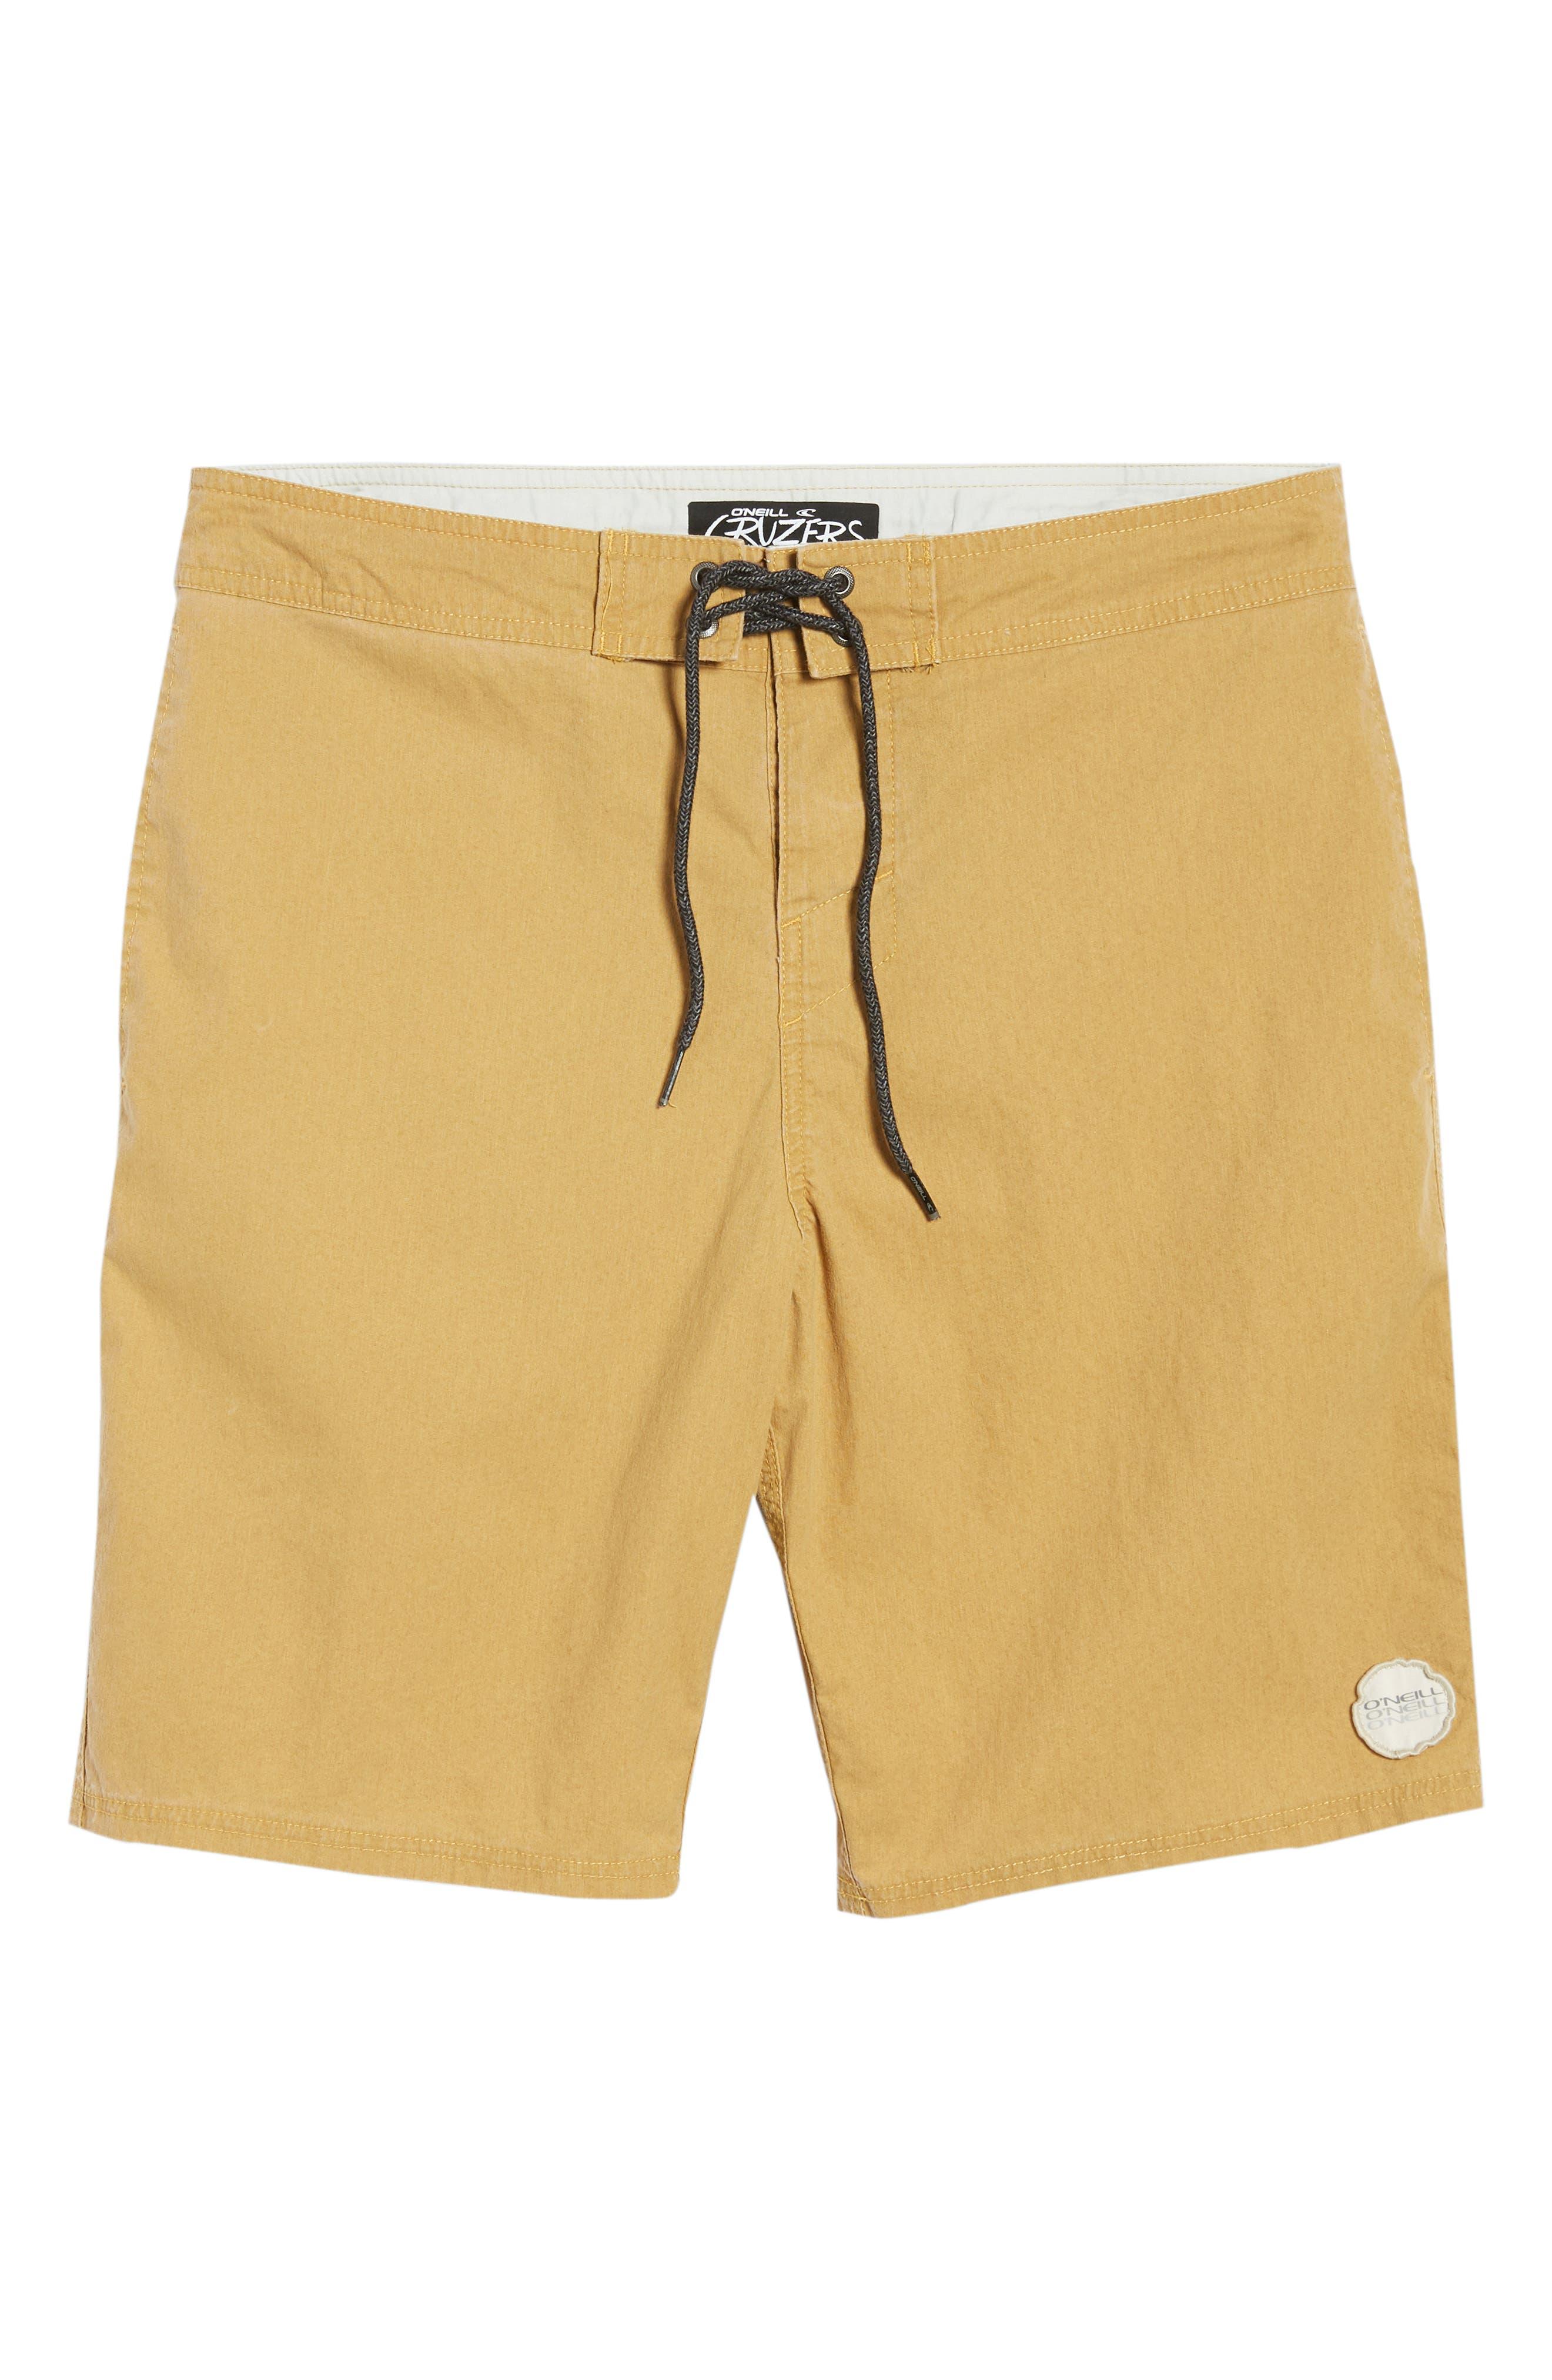 Faded Cruzer Board Shorts,                             Alternate thumbnail 6, color,                             206